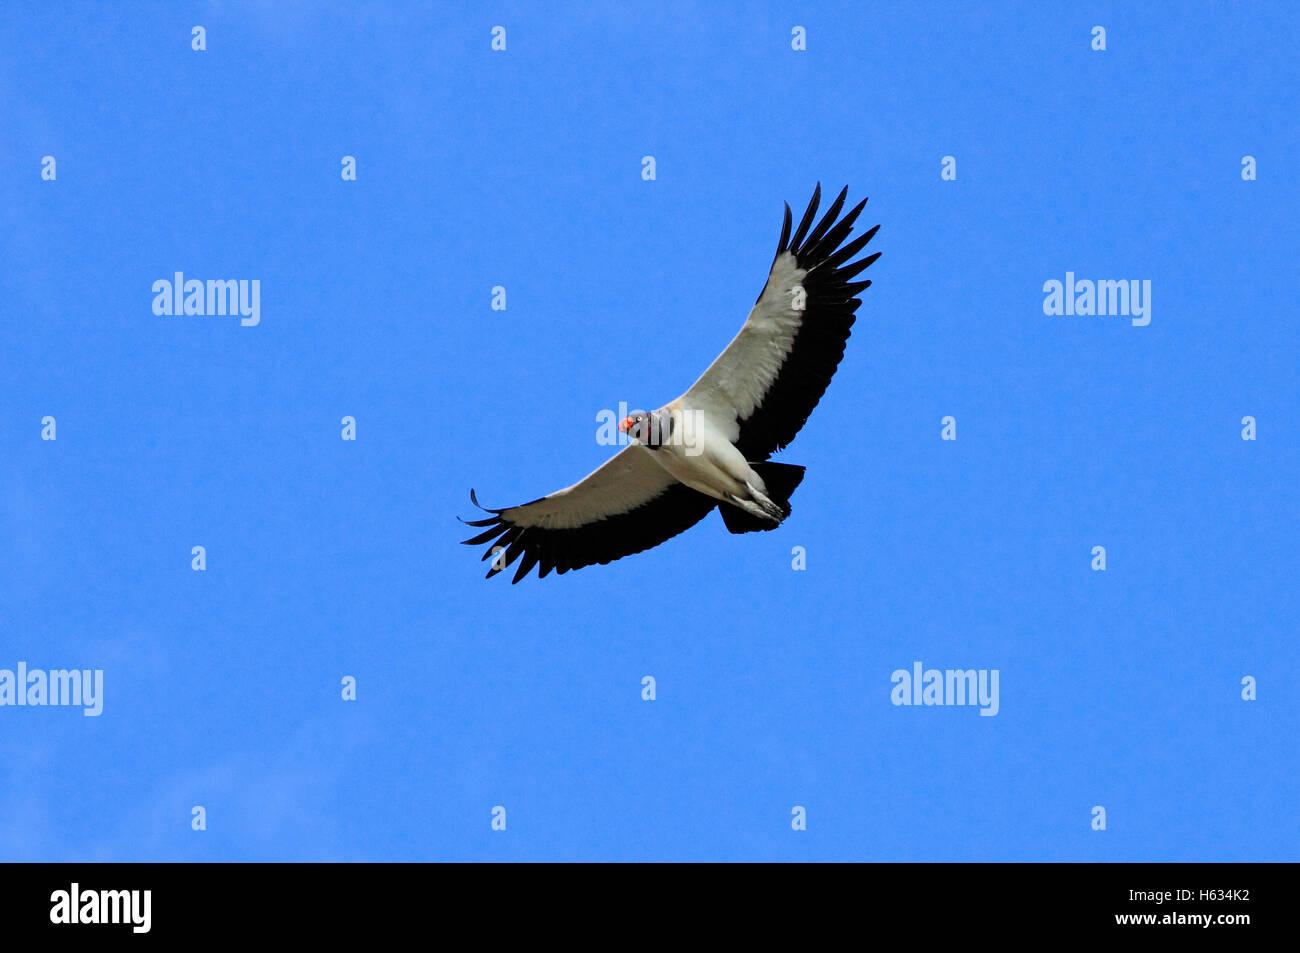 King vulture (Sarcoramphus papa) in flight. Guanacaste, Costa Rica. - Stock Image